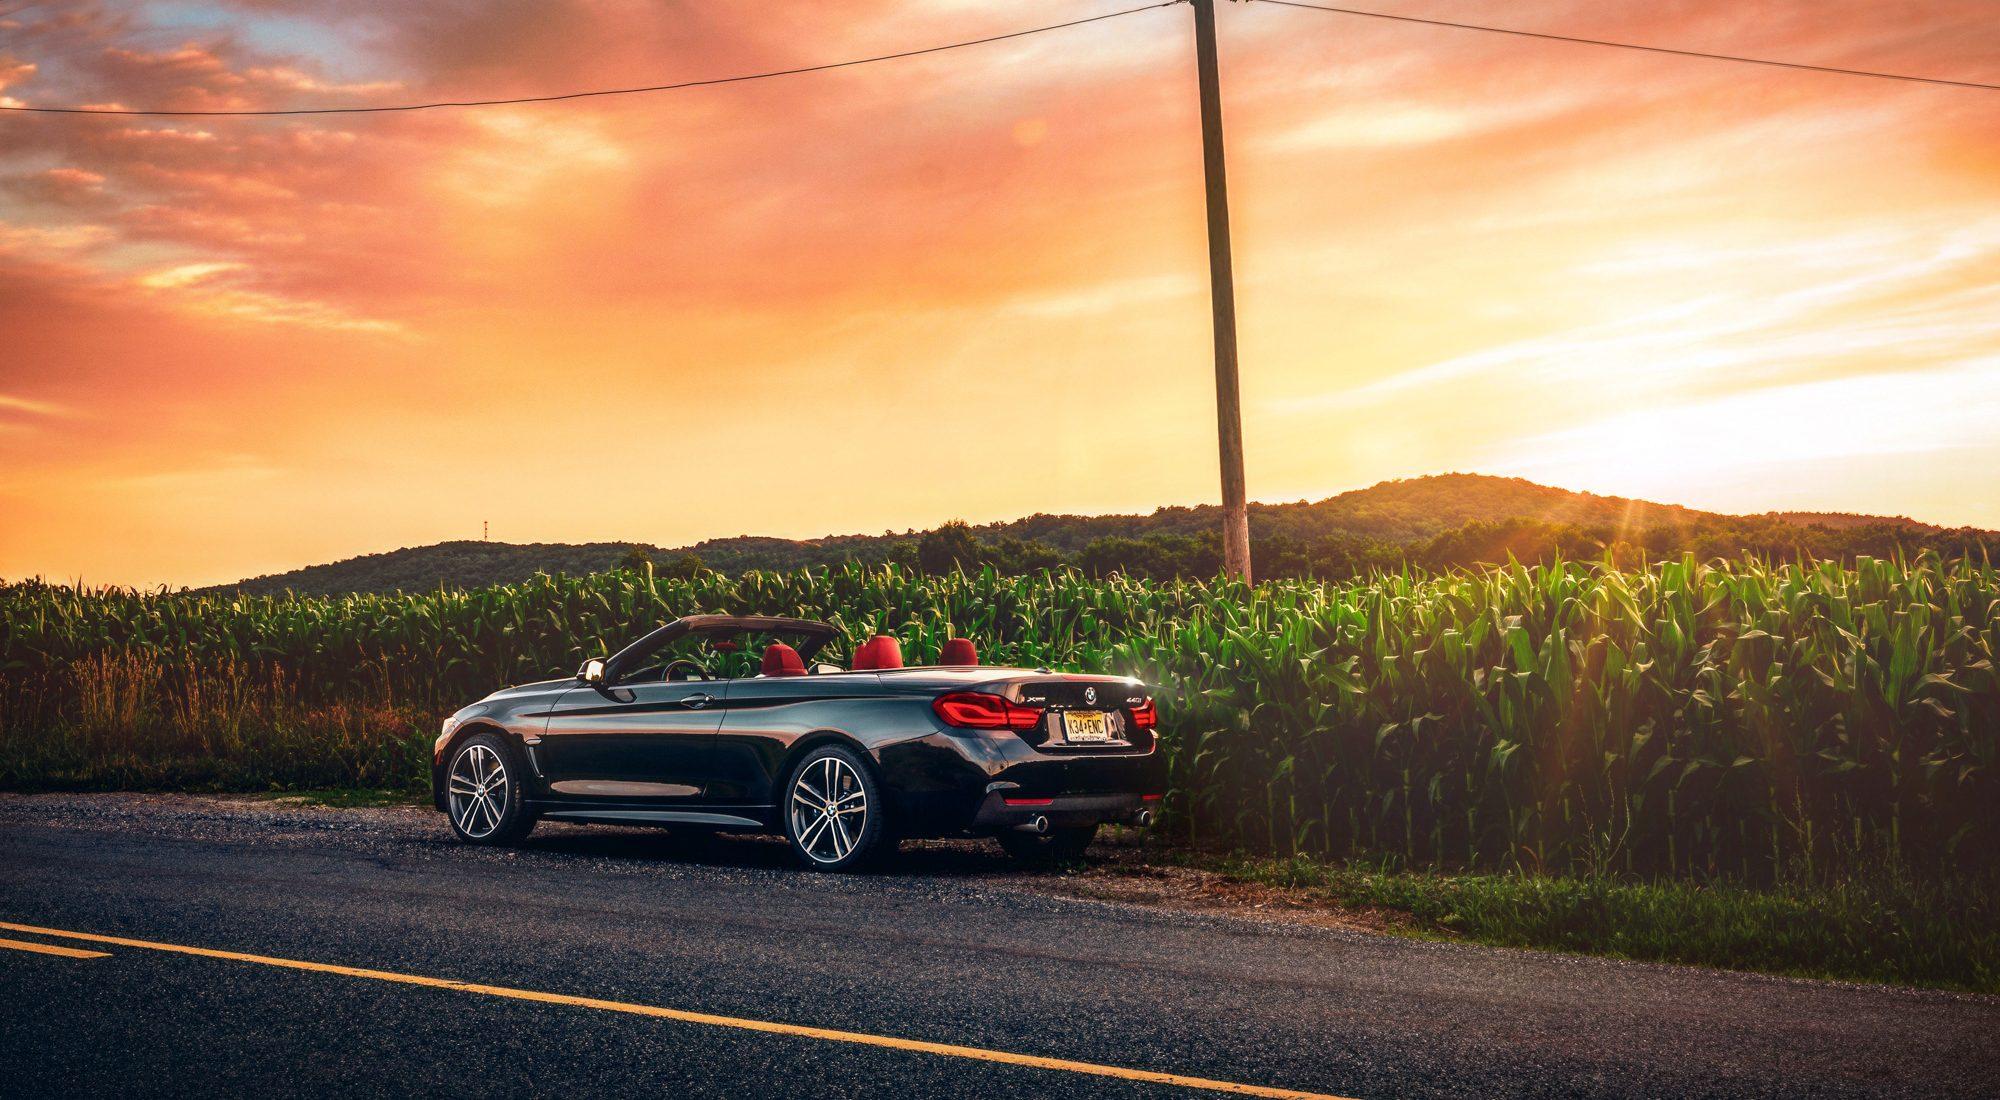 BMW 440i Convertible at sunset